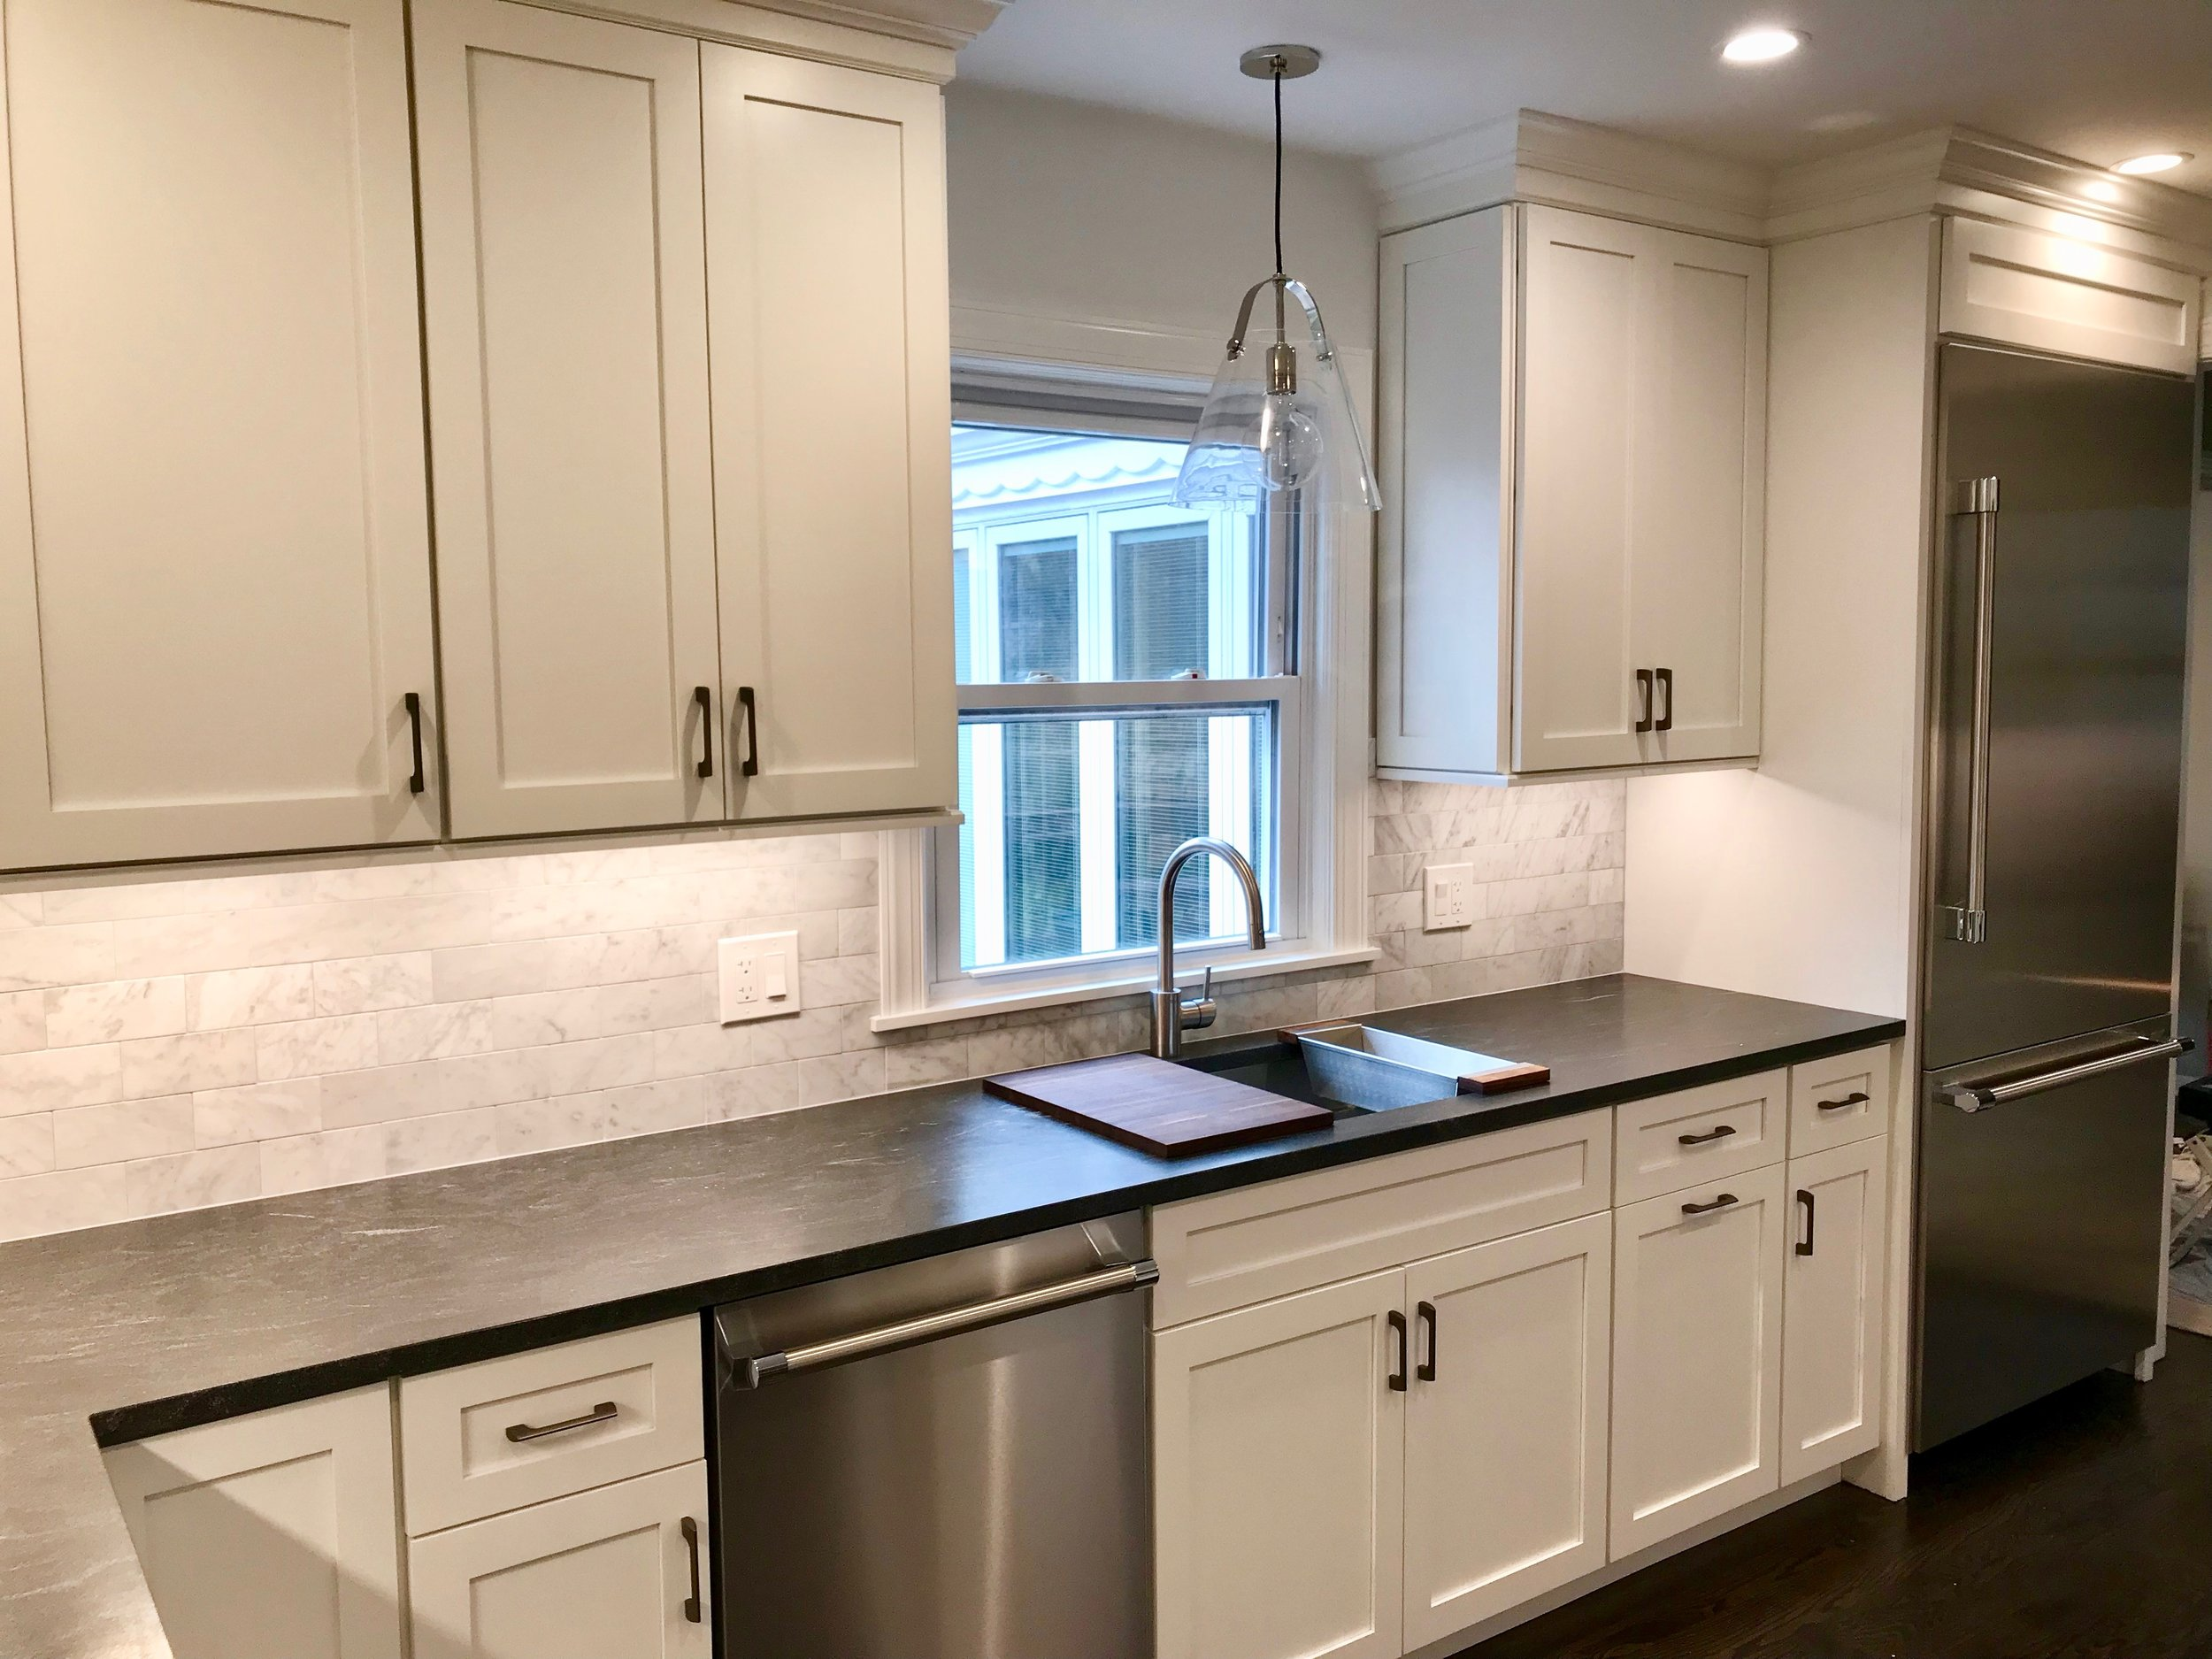 A counter-depth refrigerator is preferable despite the additional cost, especially in a small kitchen.